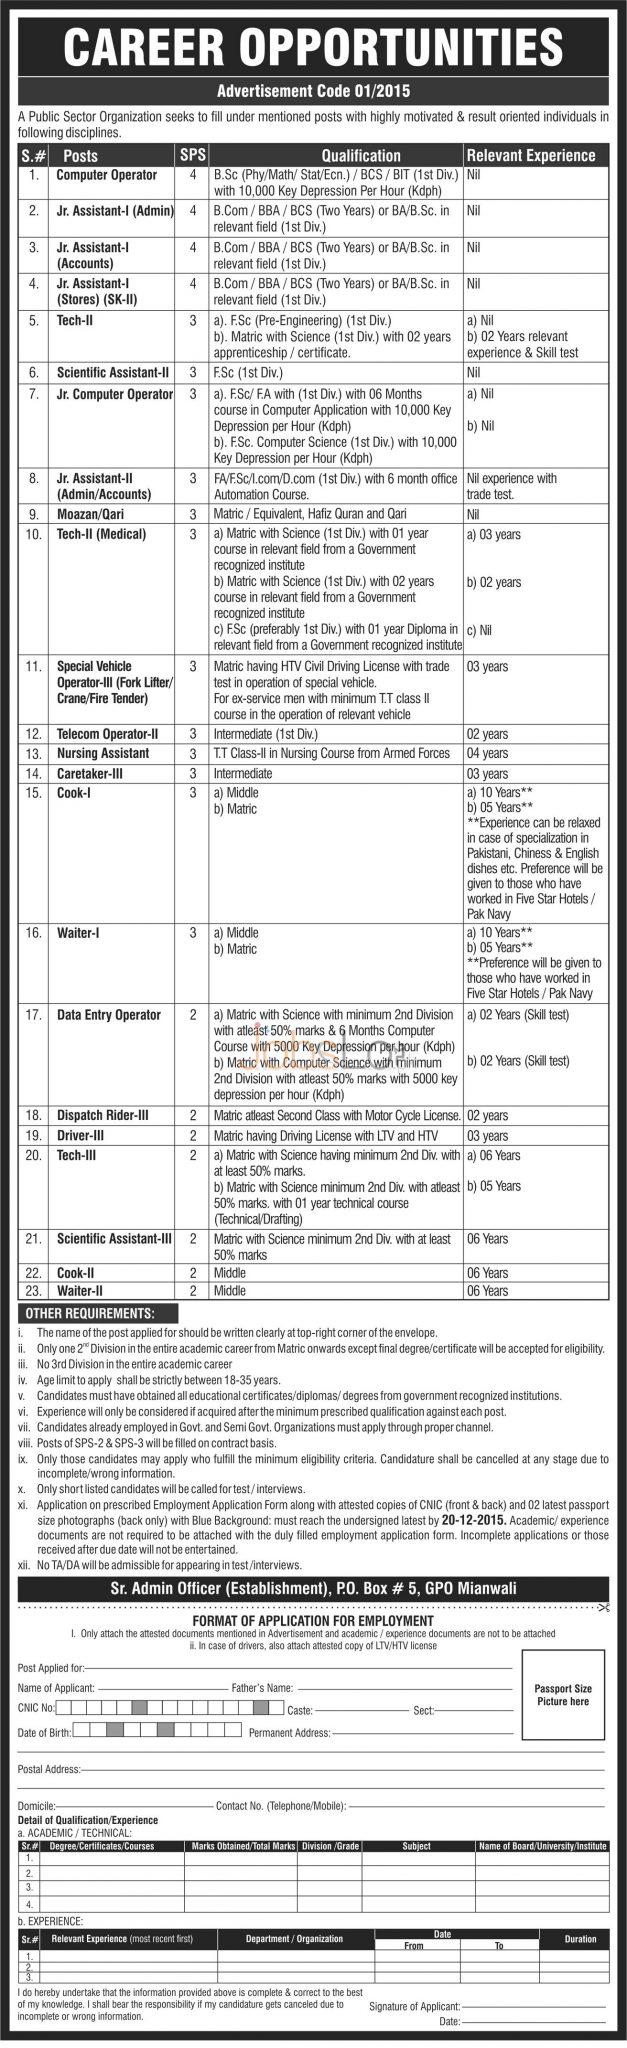 Public Sector Organization Mianwali Jobs 2015 Application Form Download